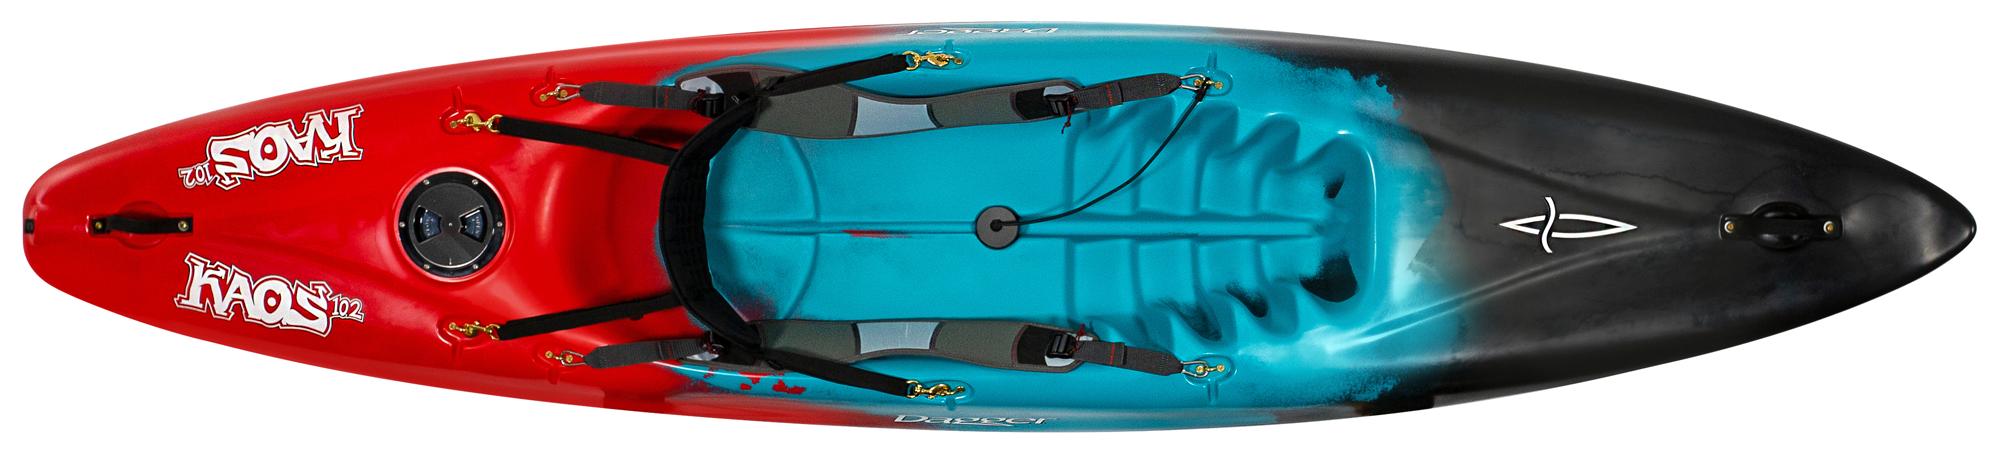 Kaos Surf Kayak - interactive Boat Layer